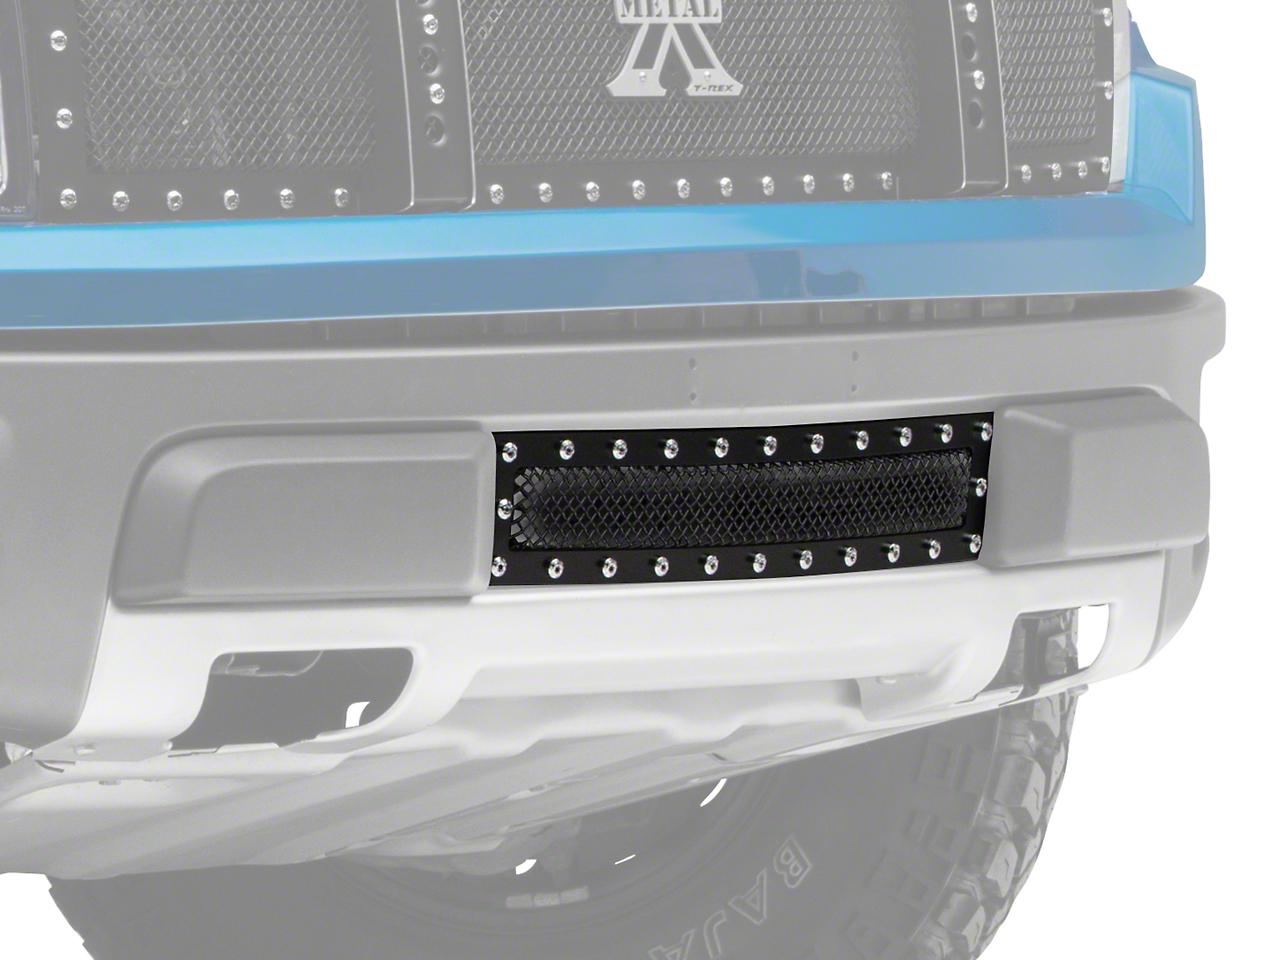 T-REX X-Metal Series Lower Bumper Grille Insert - Black (10-14 F-150 Raptor)